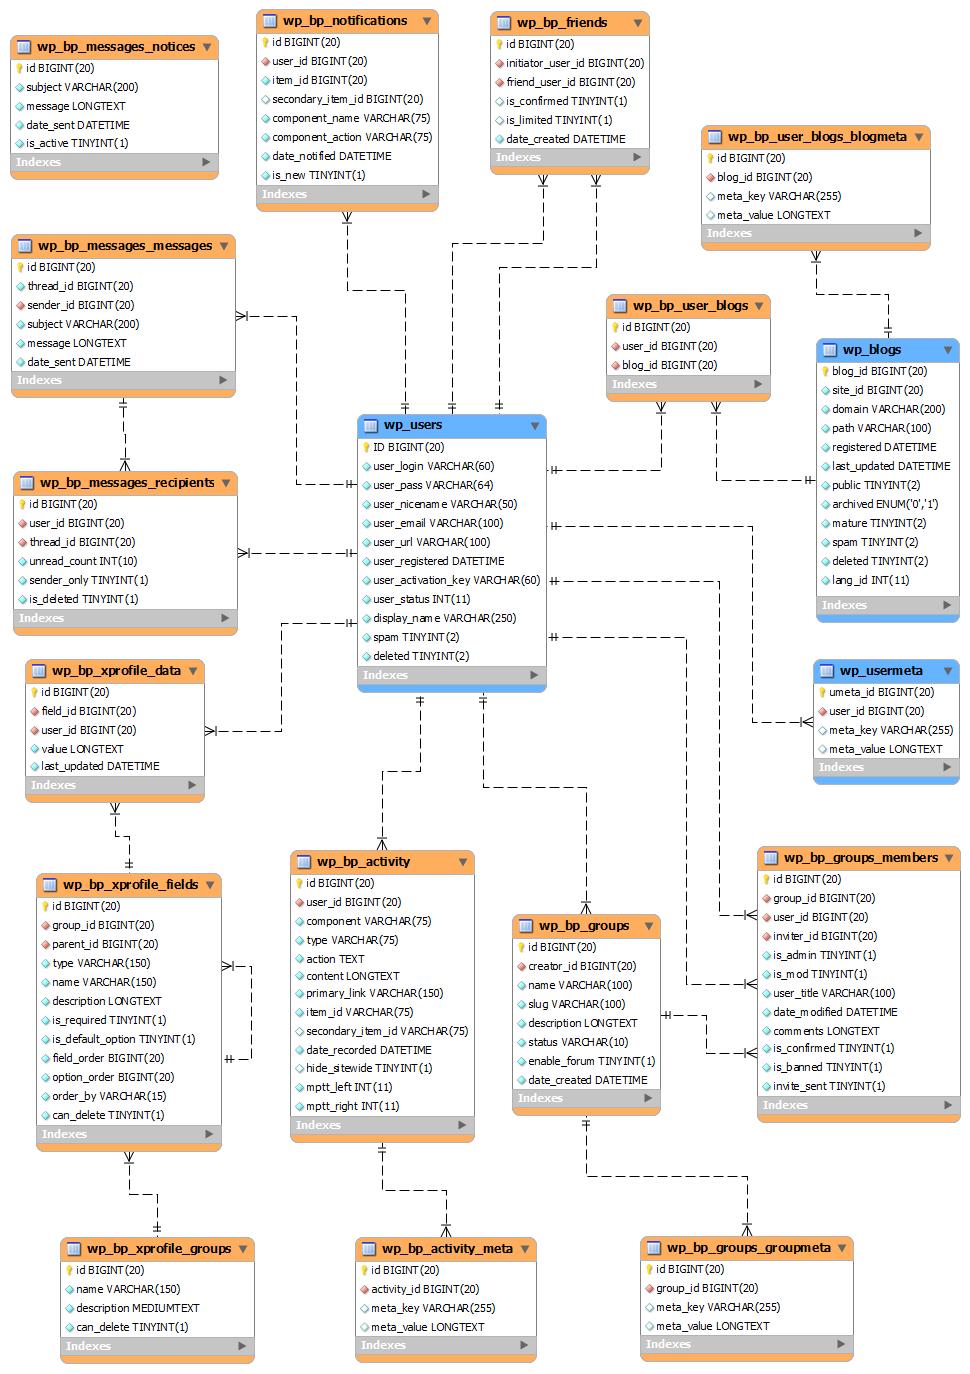 buddypress_data_model_1_3.png